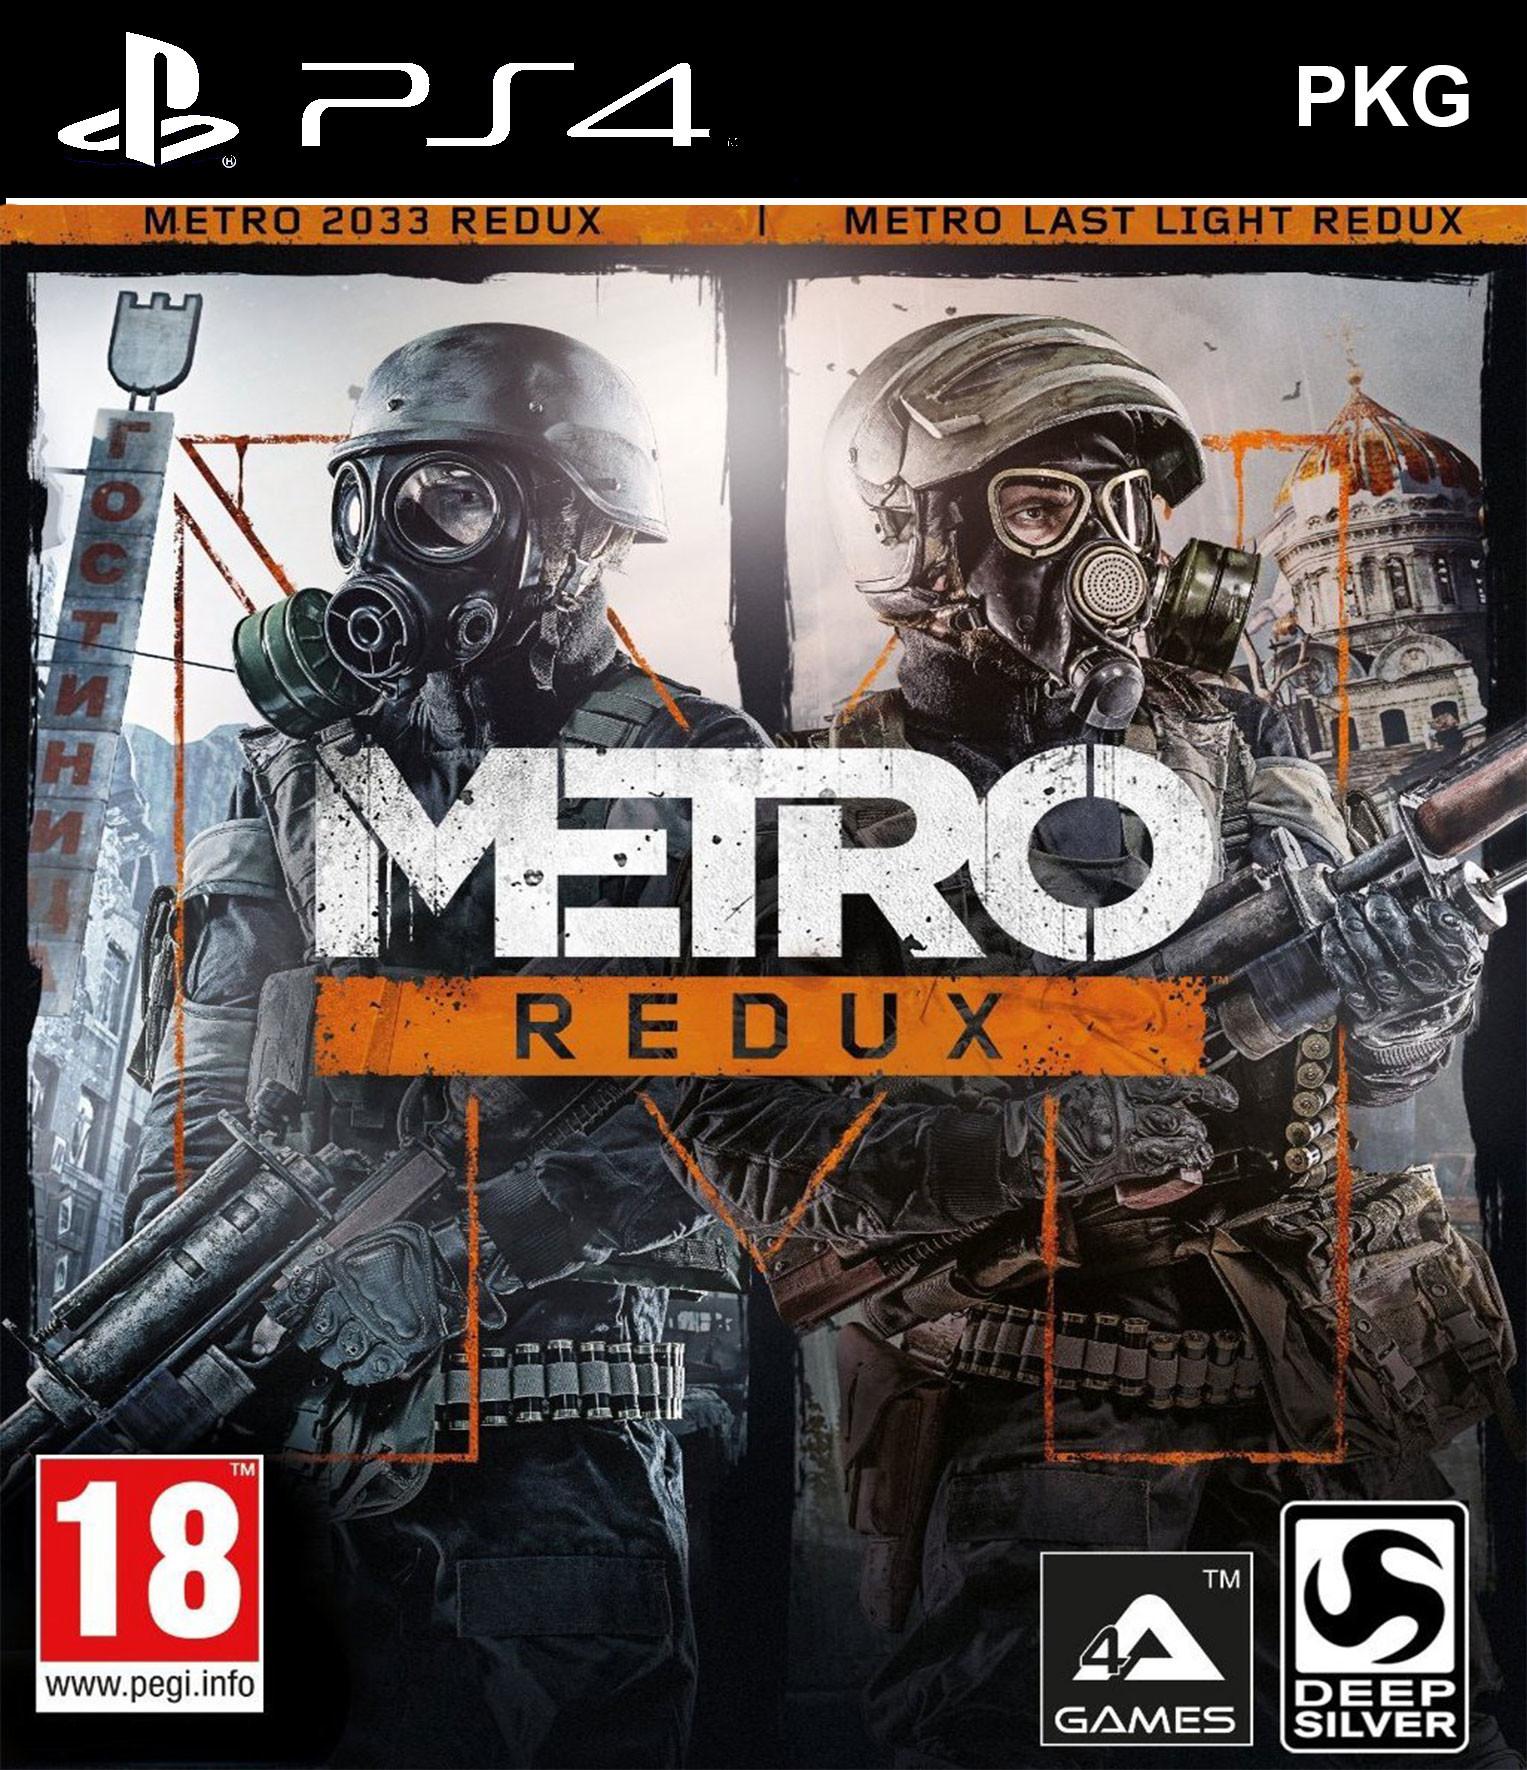 Metro Redux PKG Oyun İndir ! [4.05